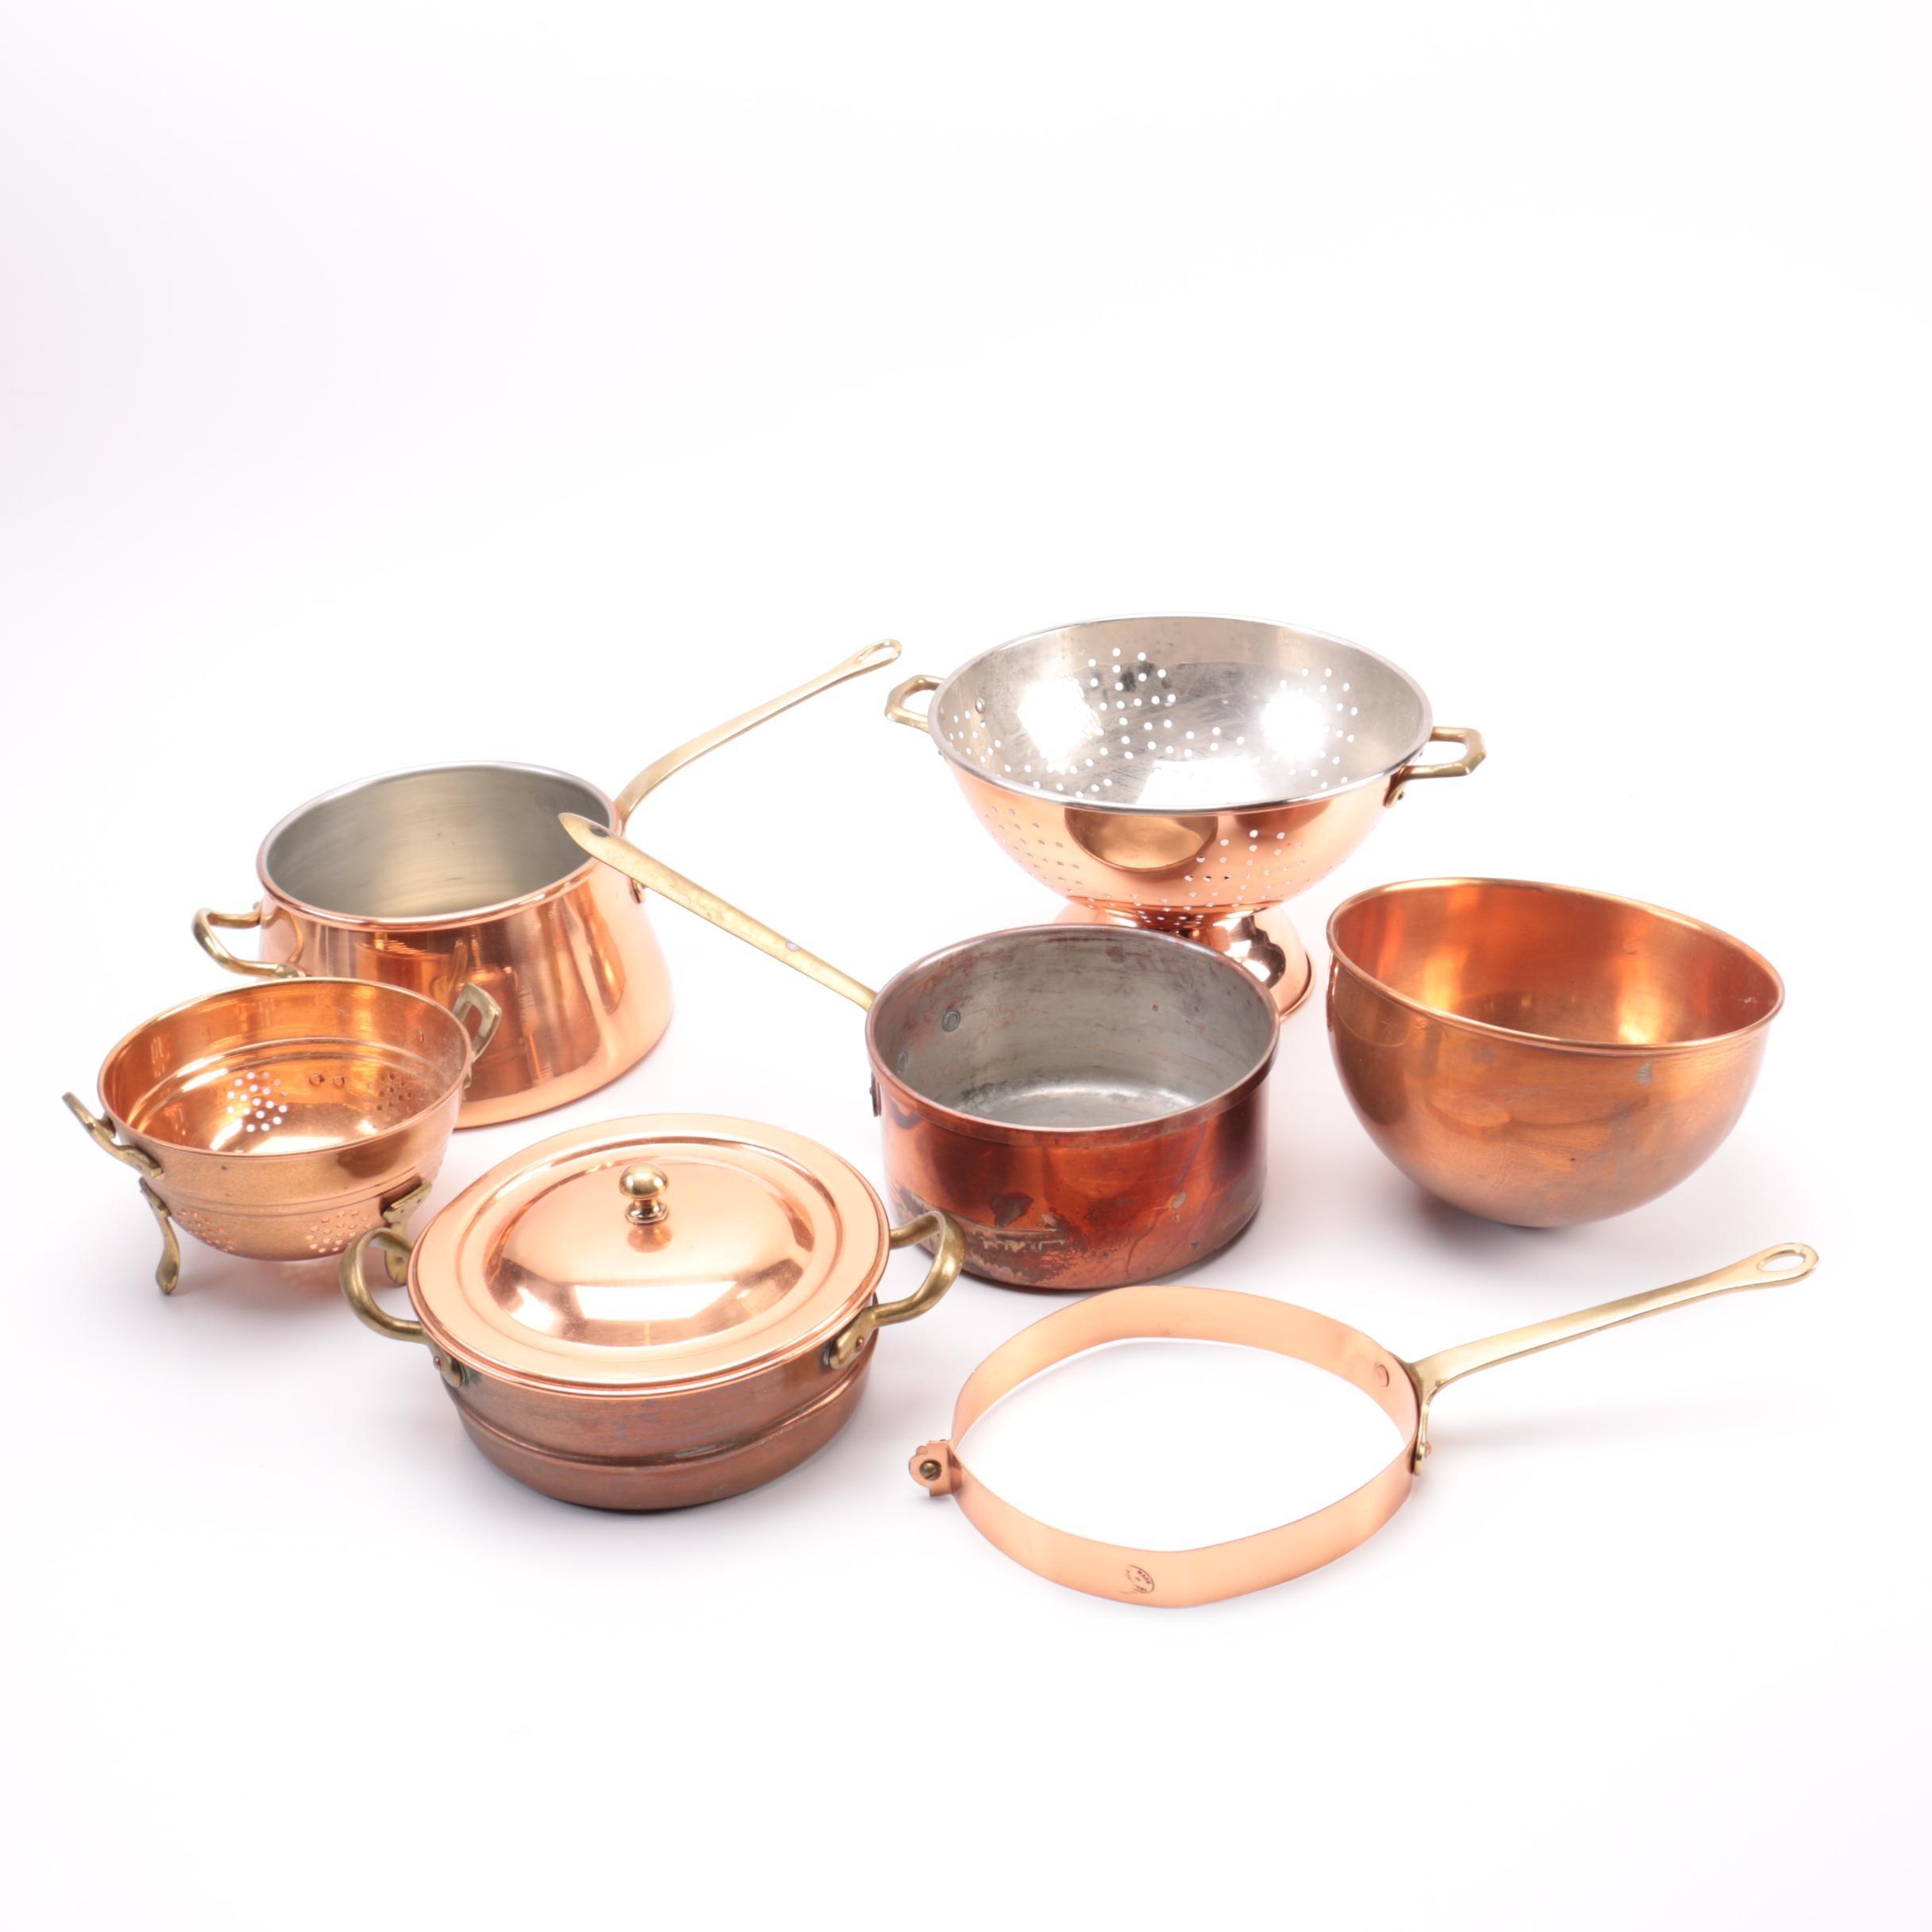 Assorted Copper Kitchenalia